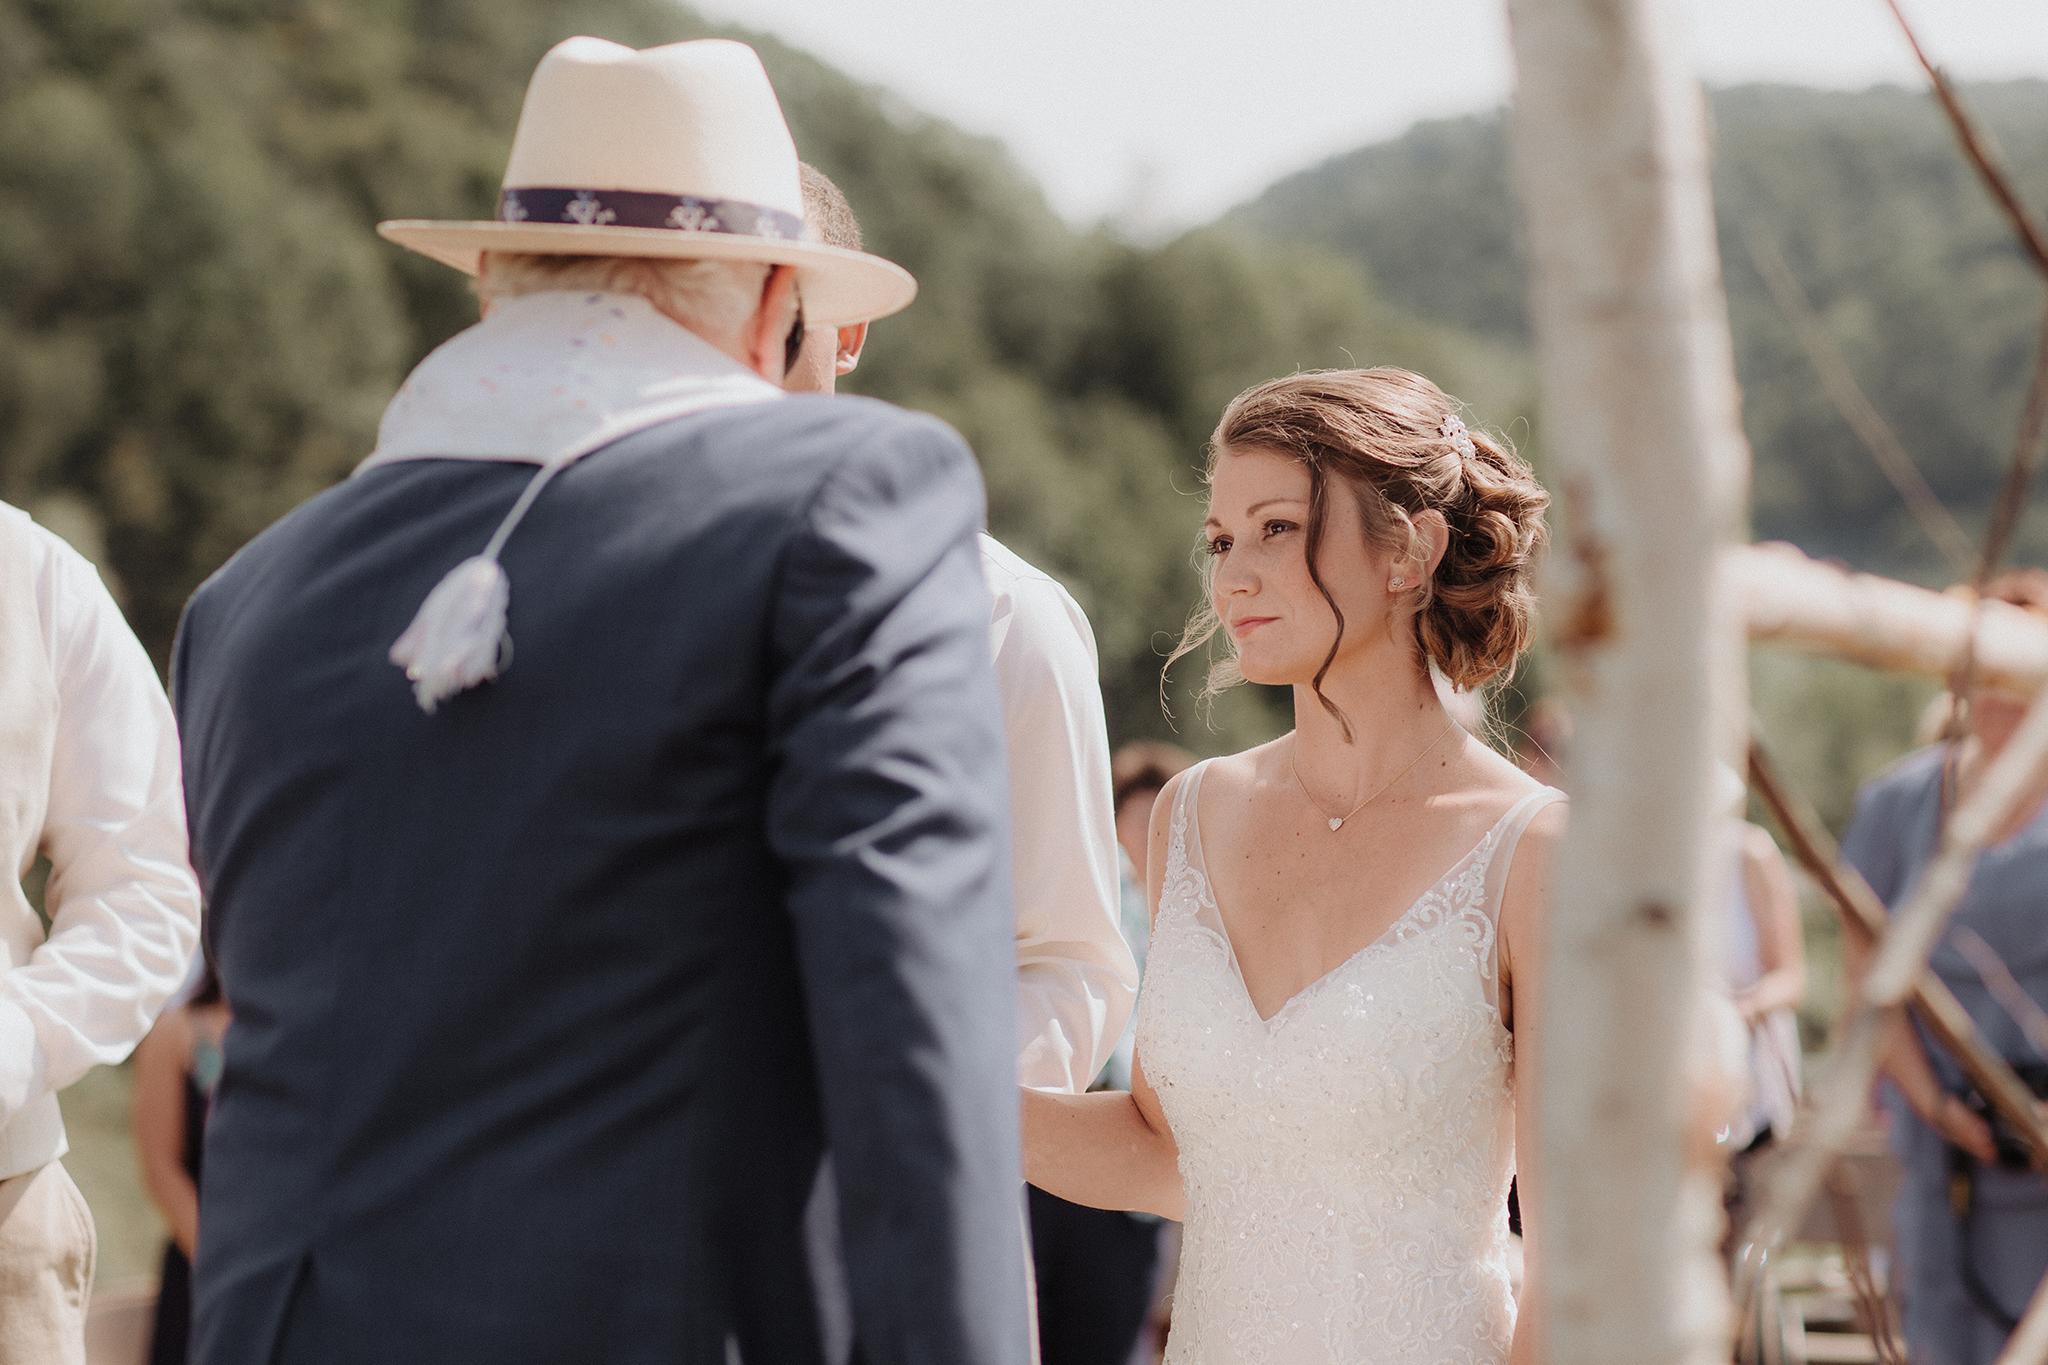 vermont-wedding-photographer-outdoor-farm-wedding-9.jpg